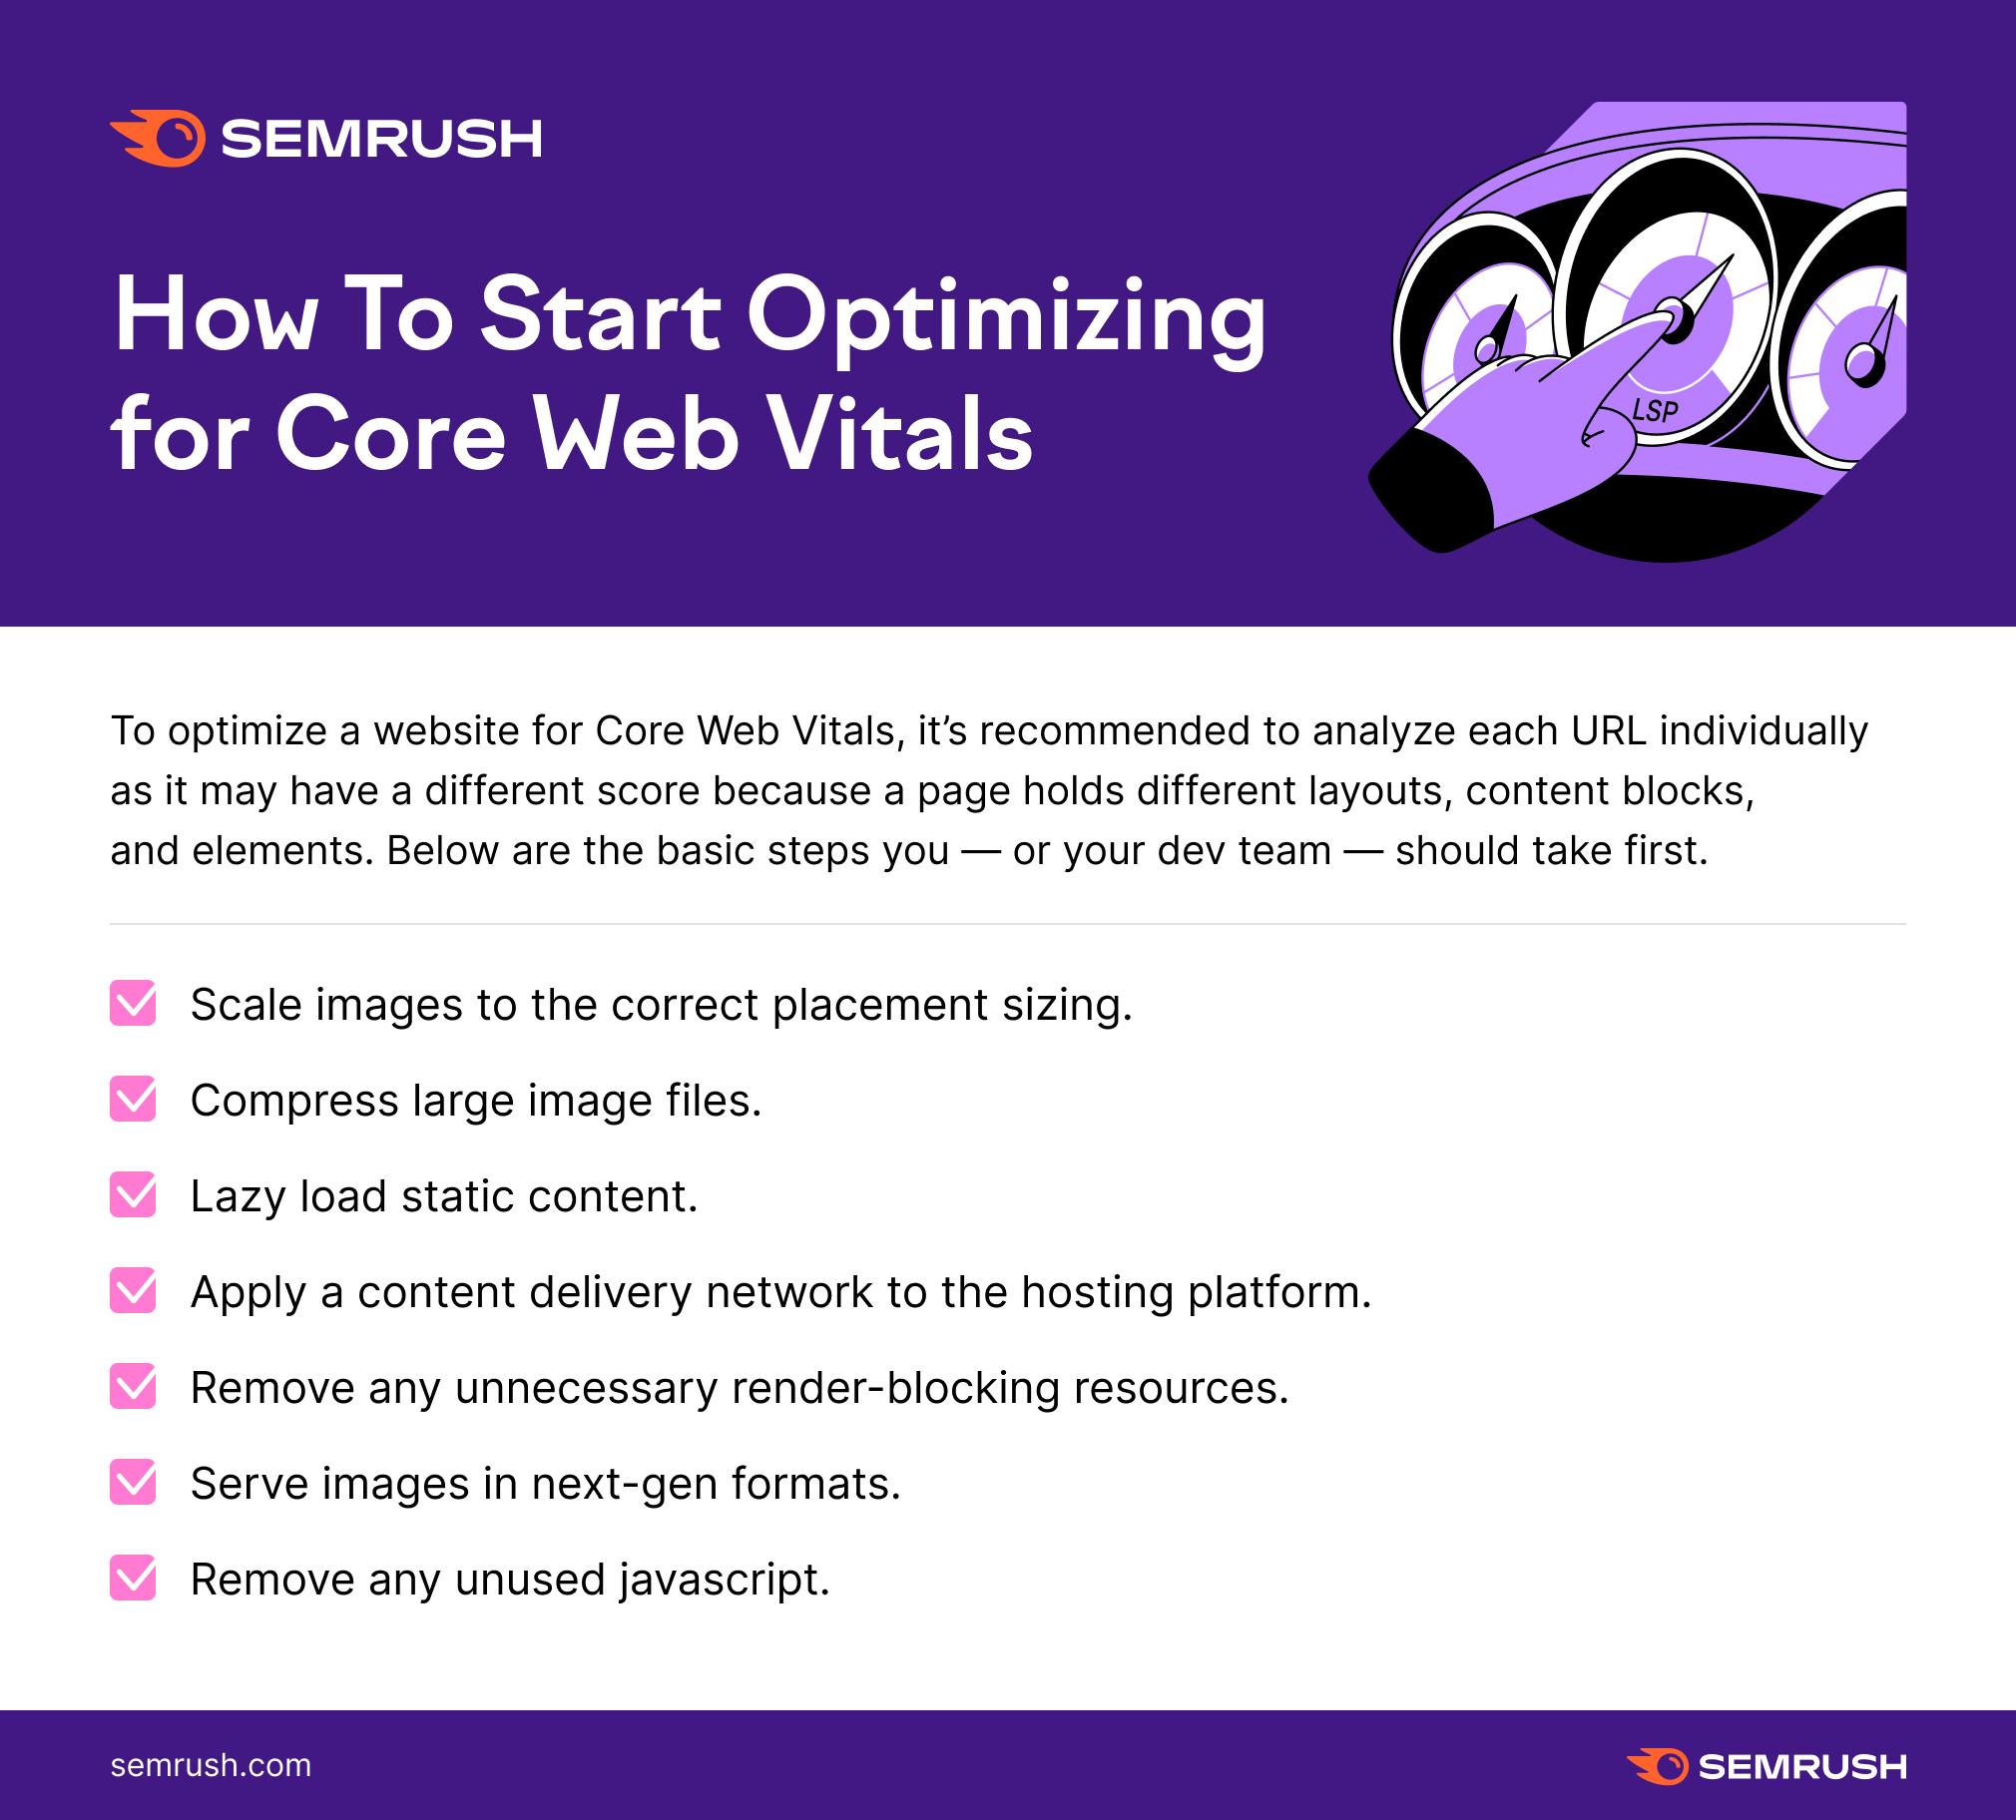 Start Optimizing for Core Web Vitals